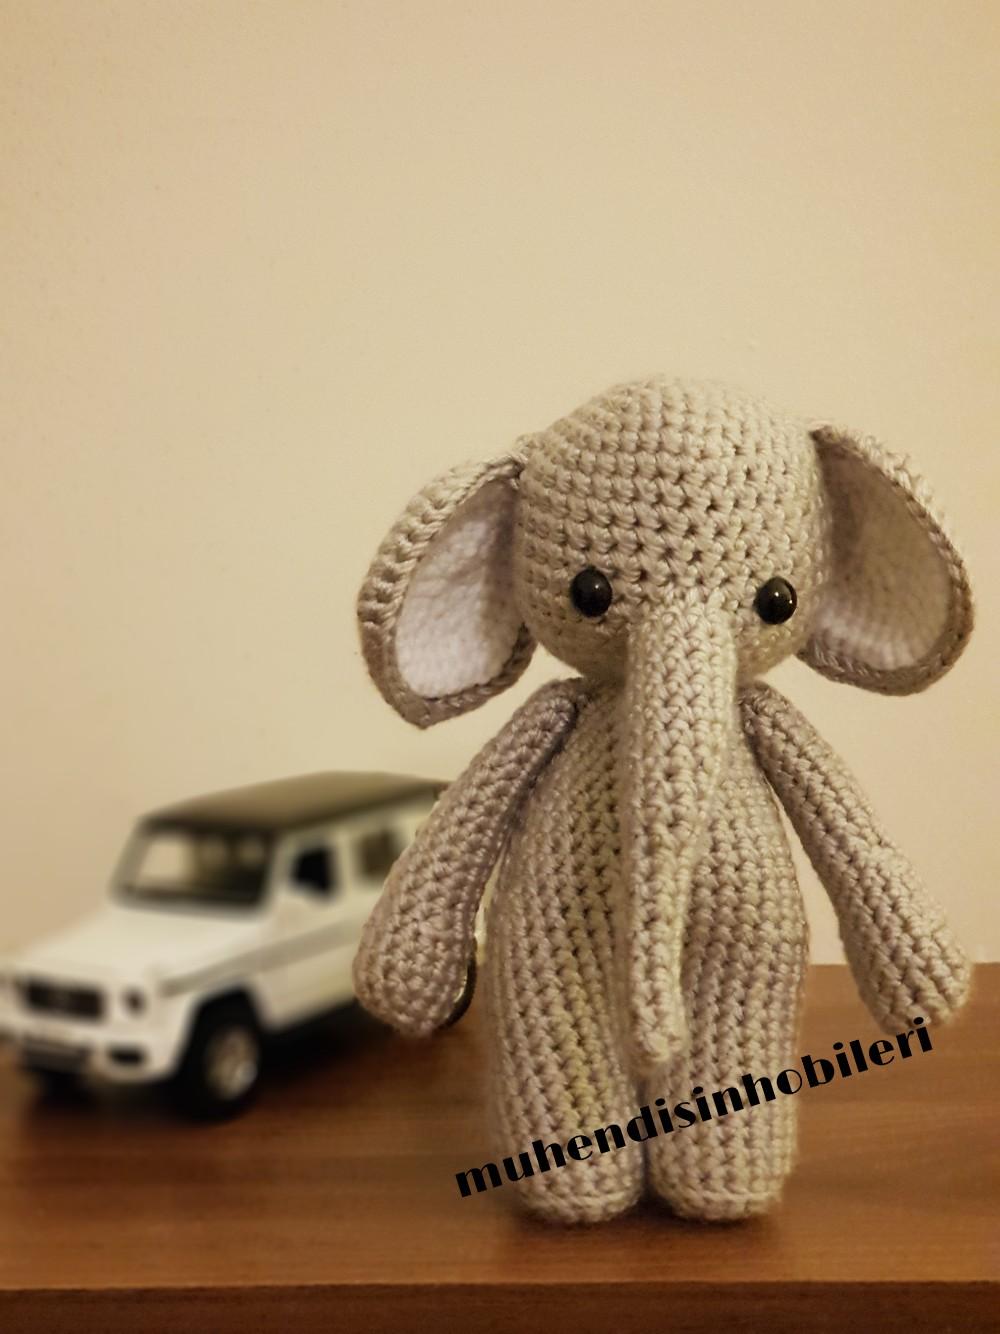 Amigurumi Today: free patterns & crochet tutorials - Apps on ... | 1334x1000